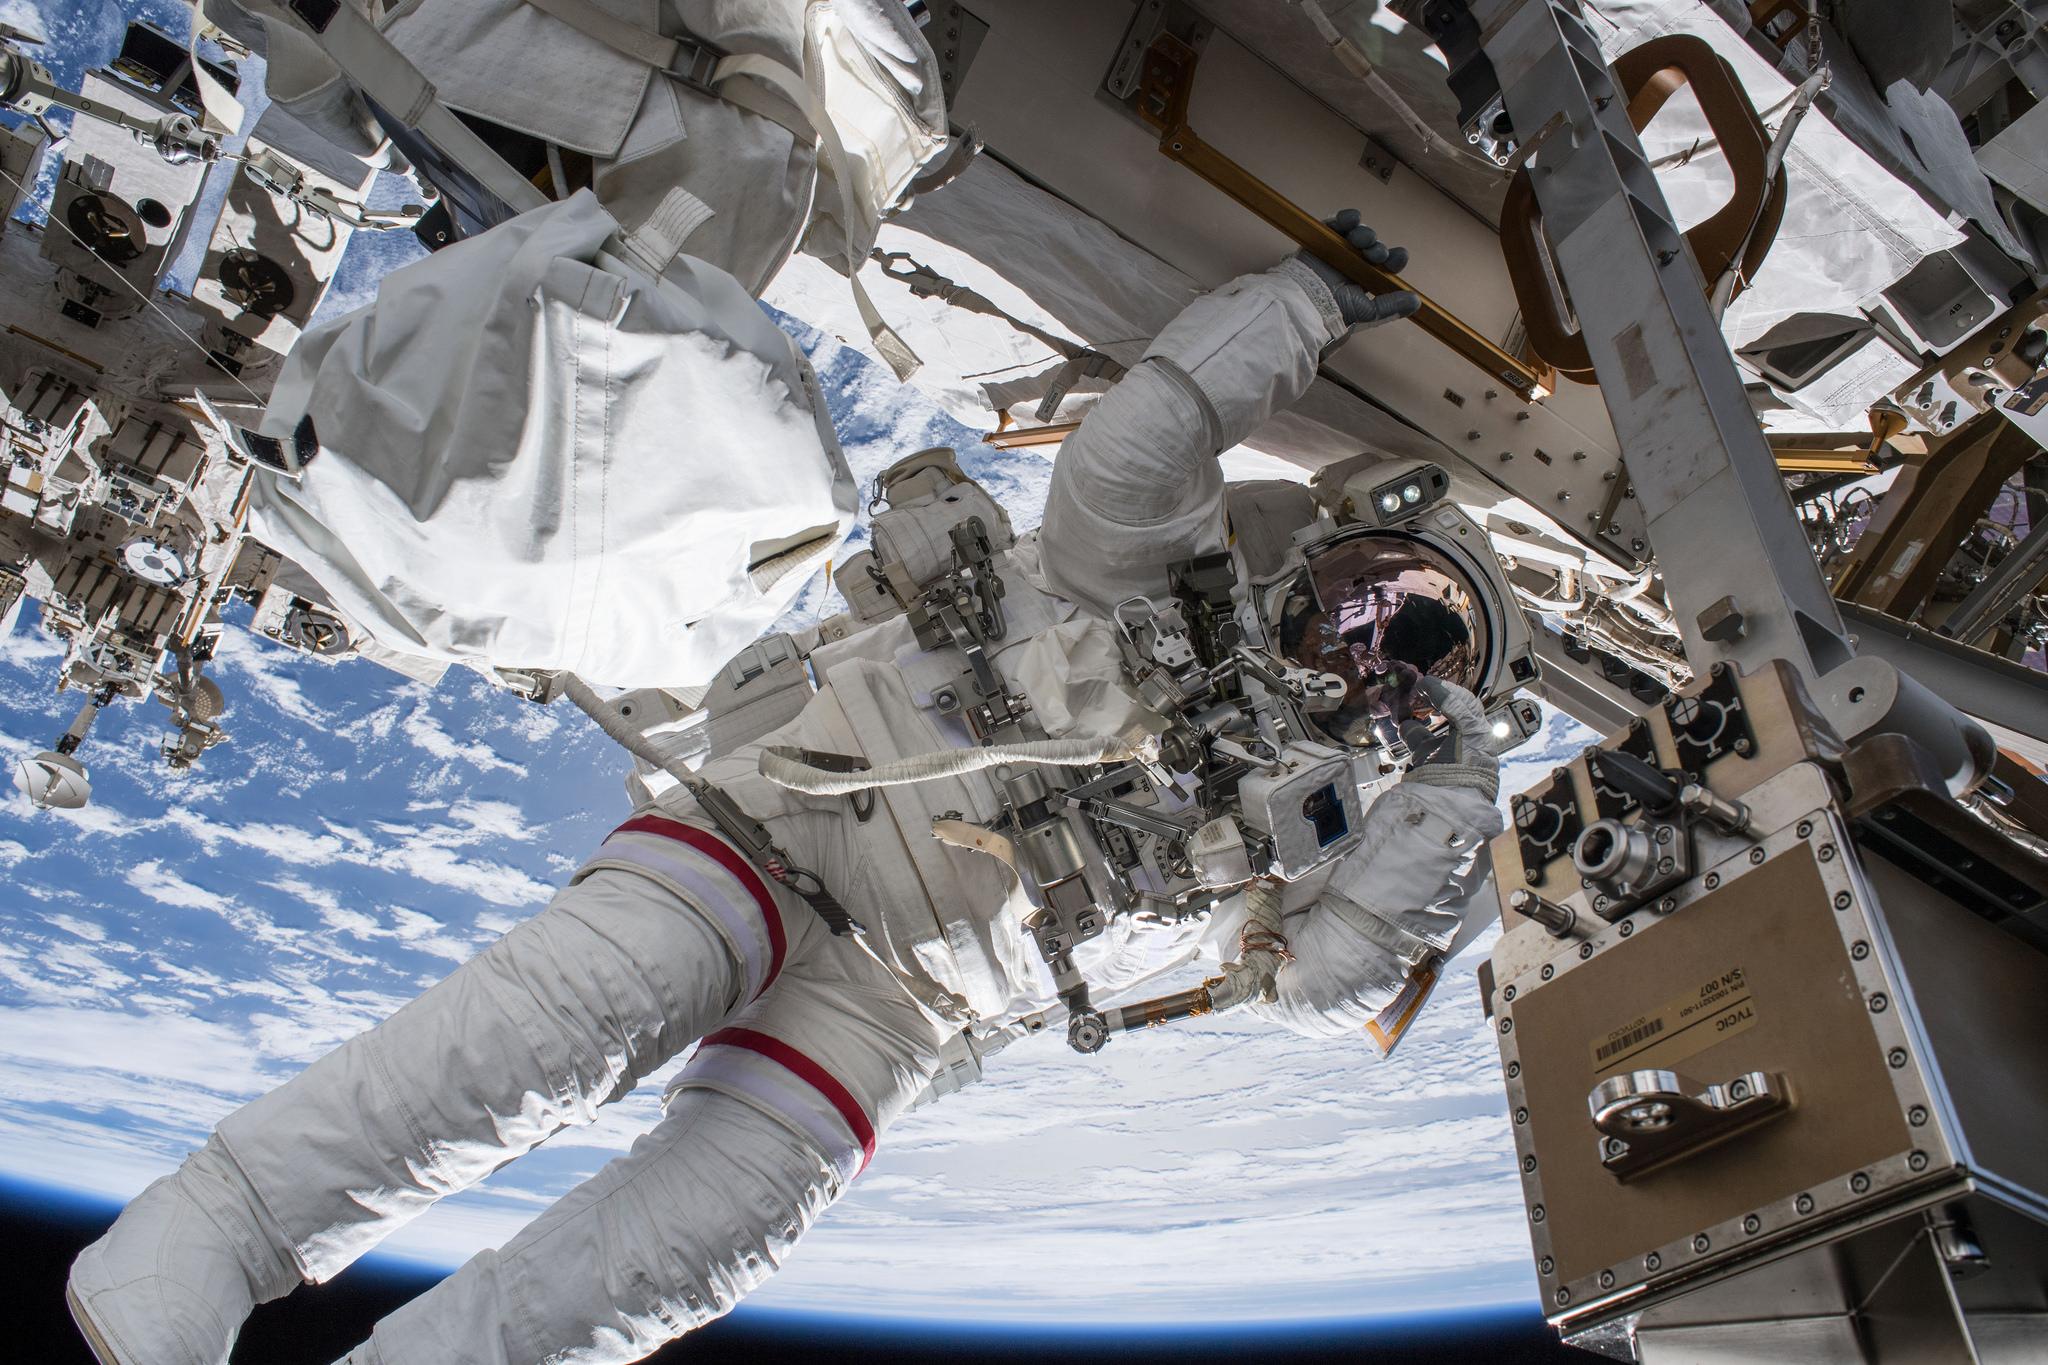 NASA astronaut Drew Feustel